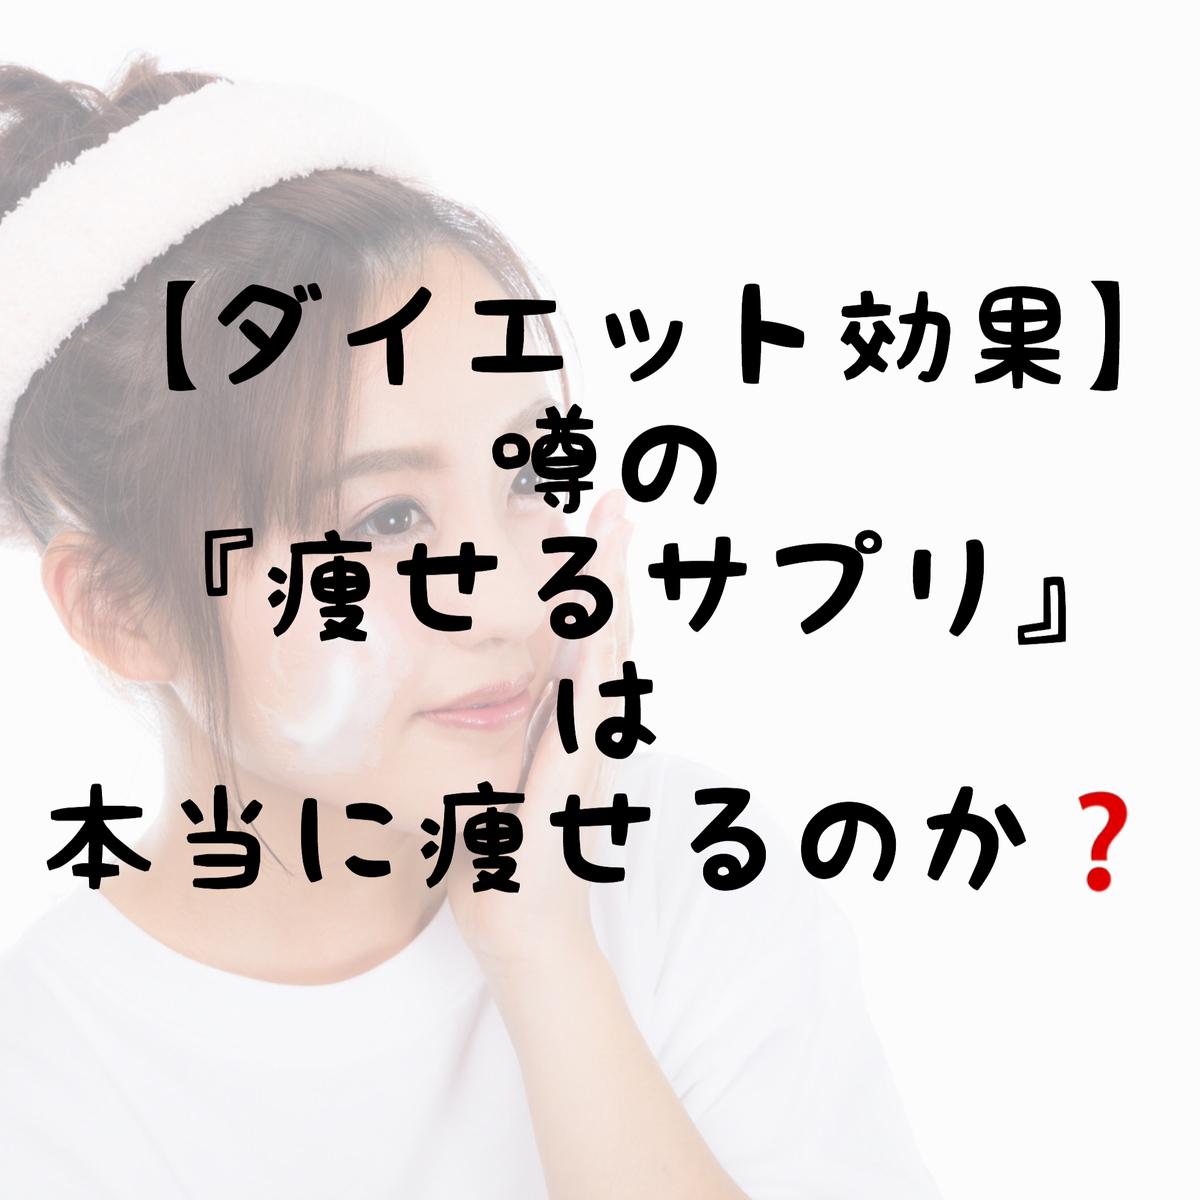 f:id:nokonoko_o:20200523150611j:plain